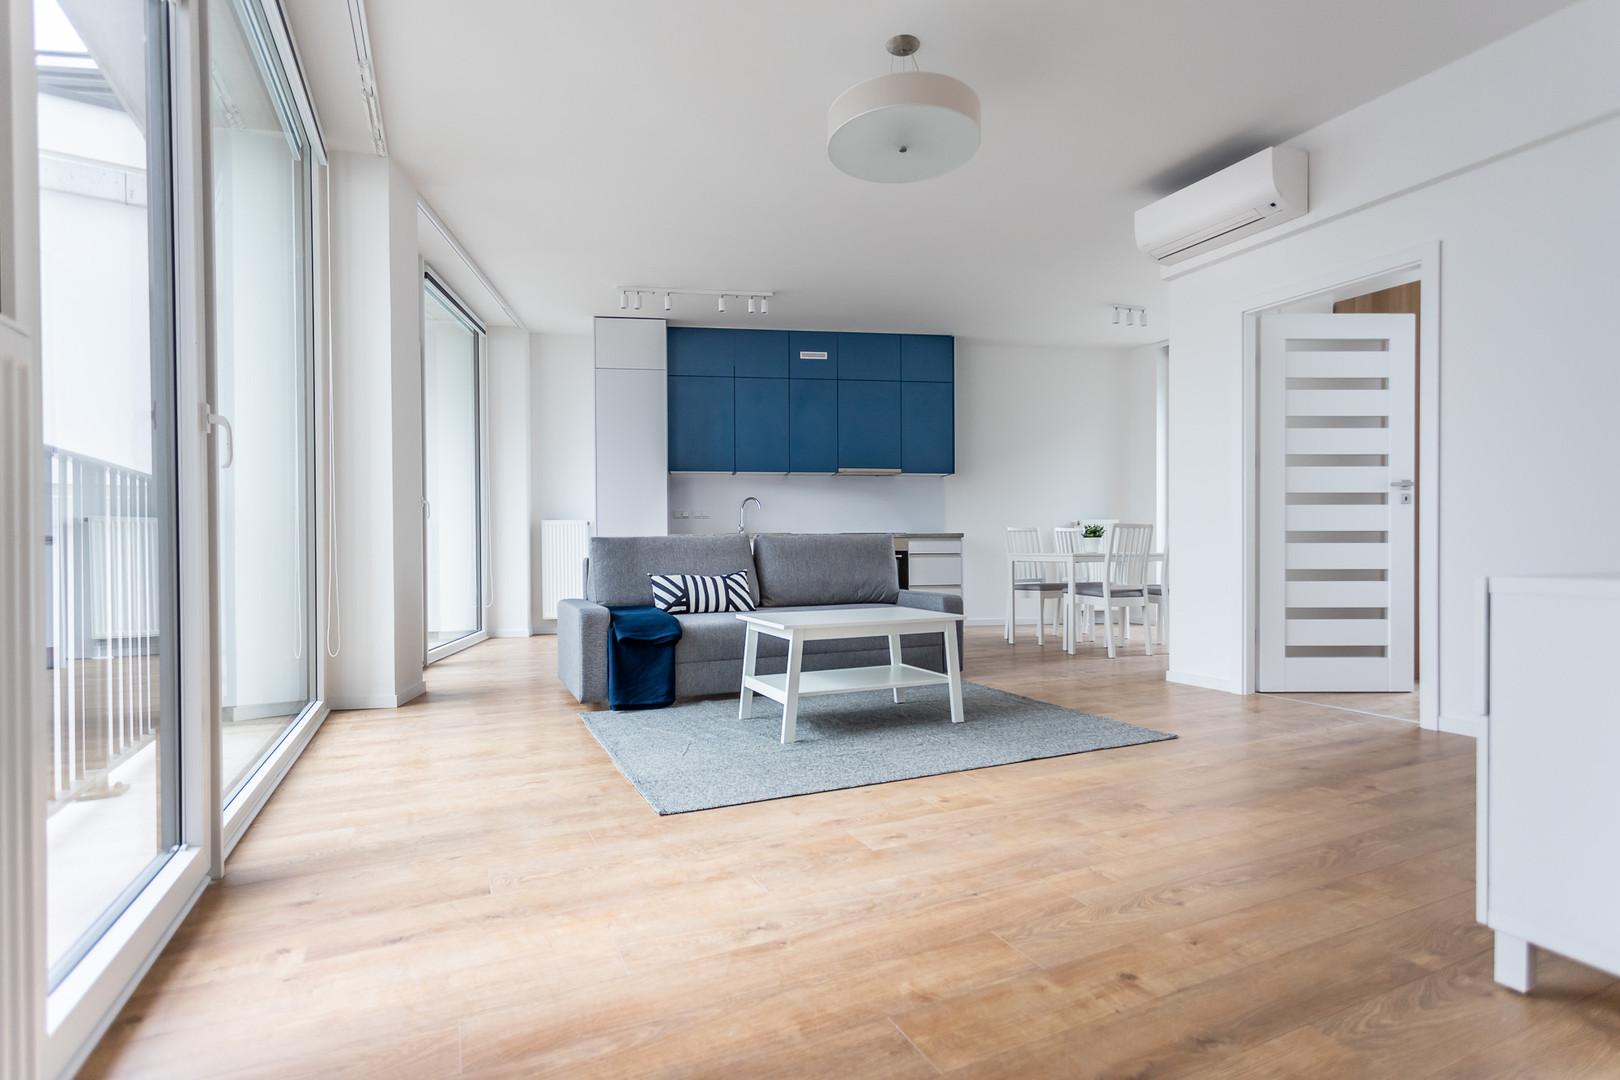 Poznan 2 bedroom apartments for rent.jpg